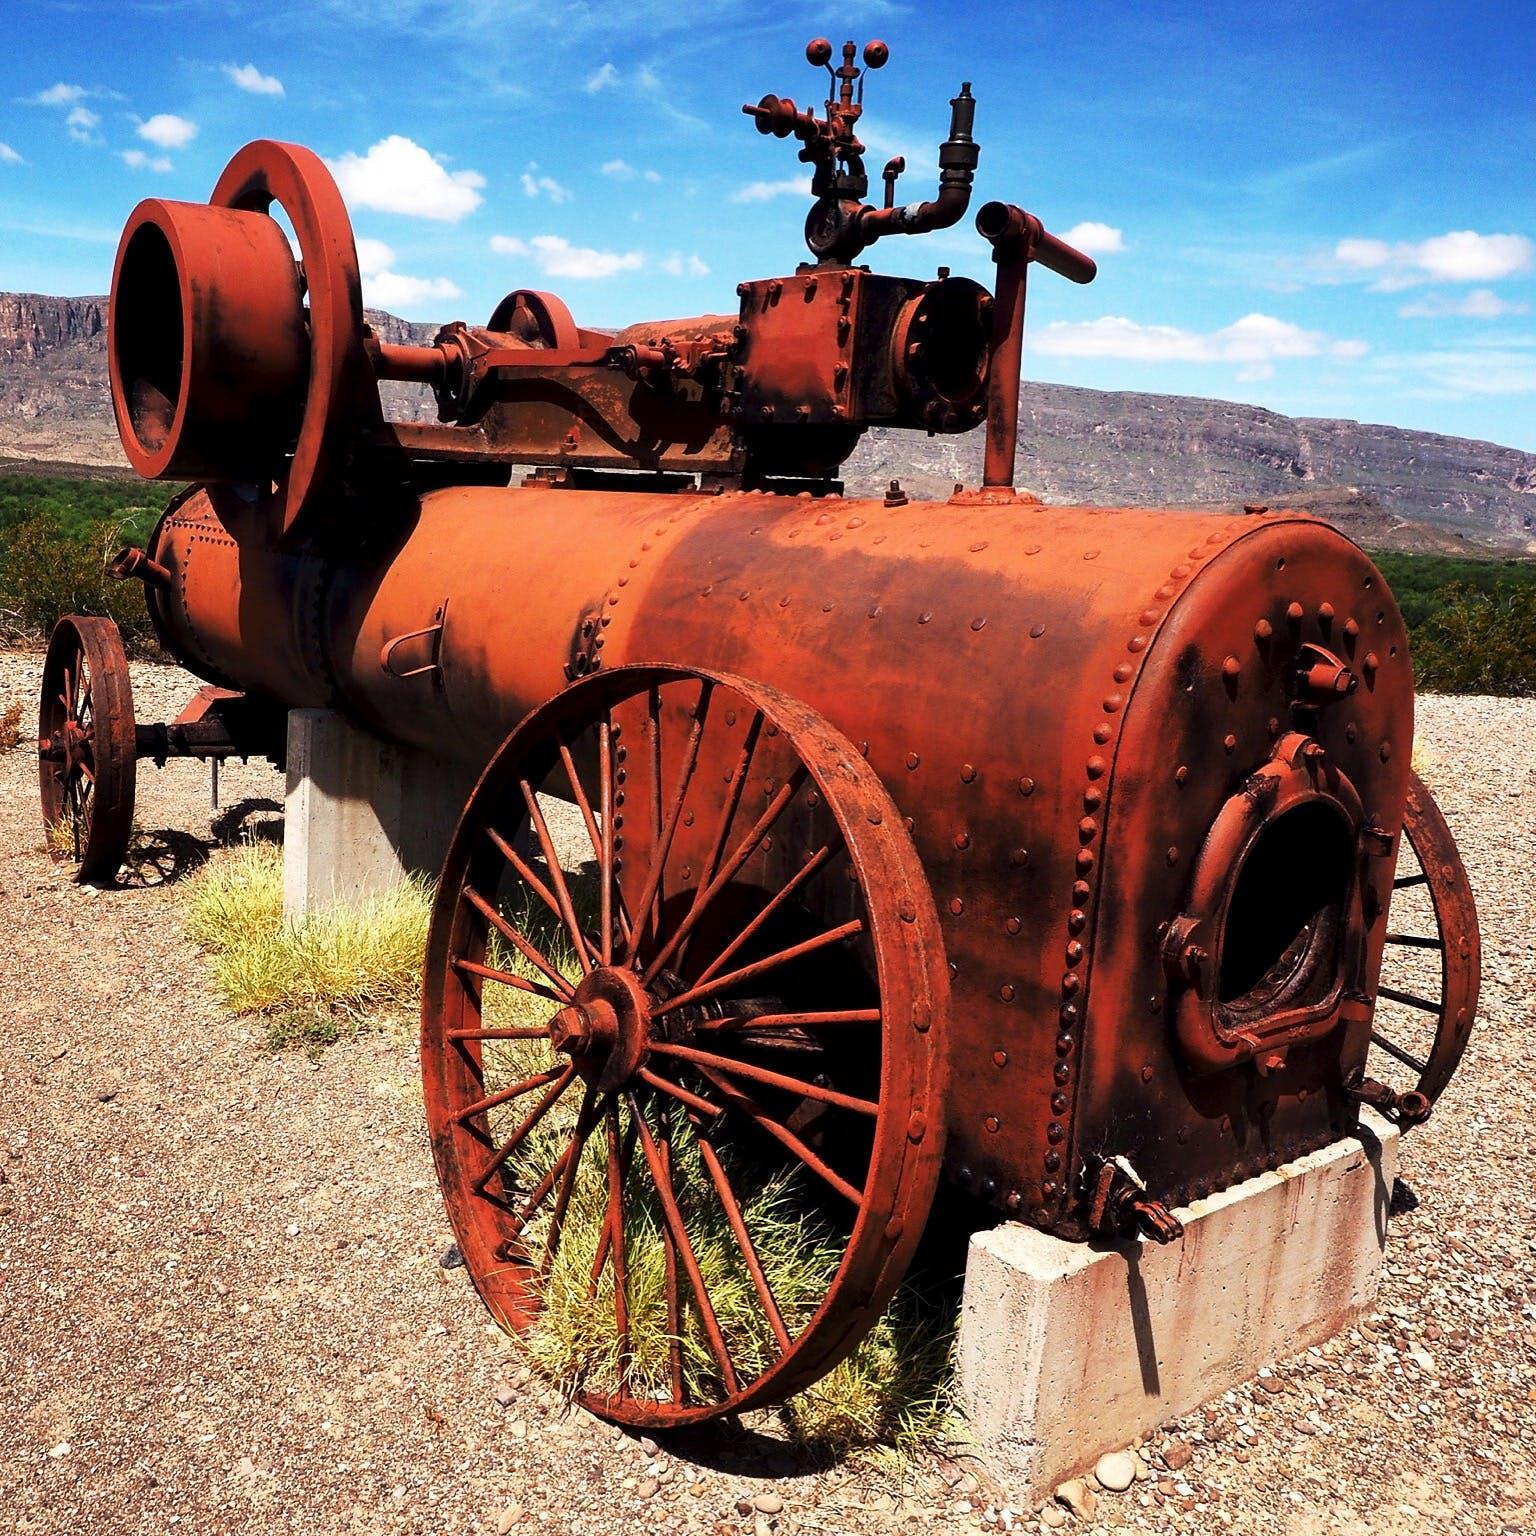 Red Metallic Vintage Machine